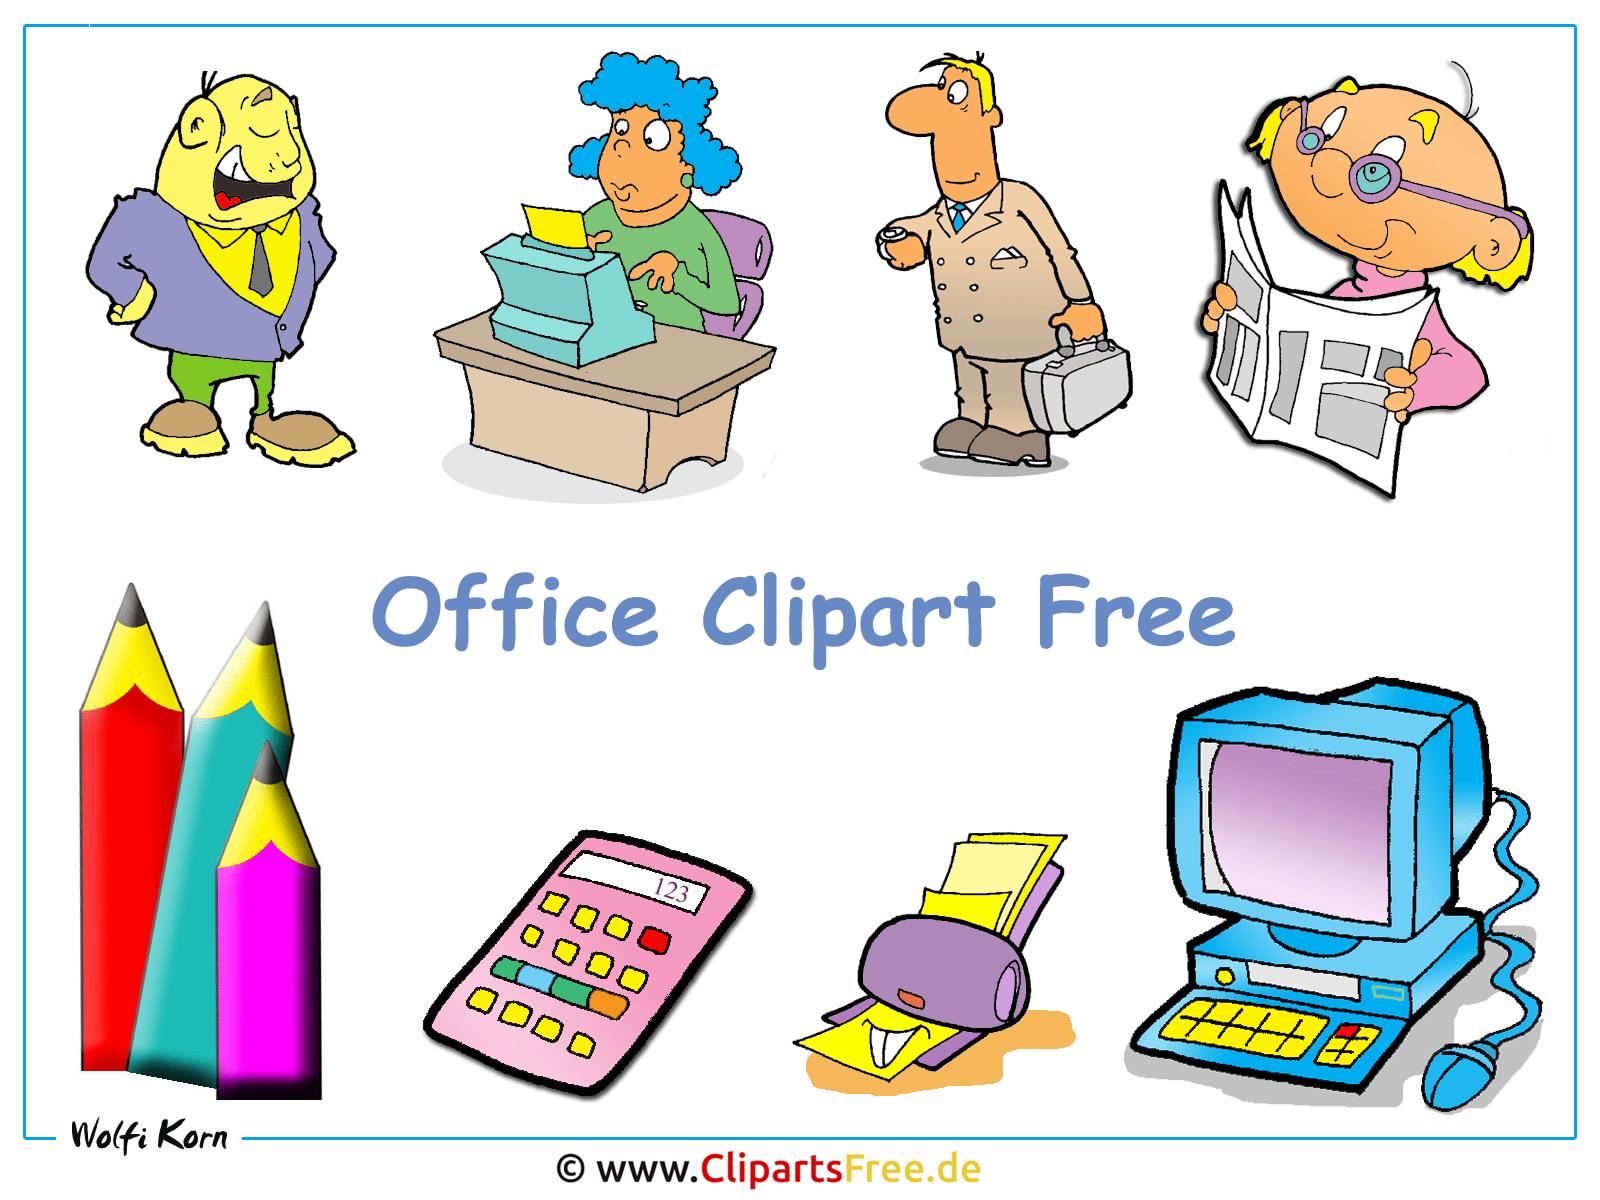 Office Clipart Bilder kostenlos - Wallpaper